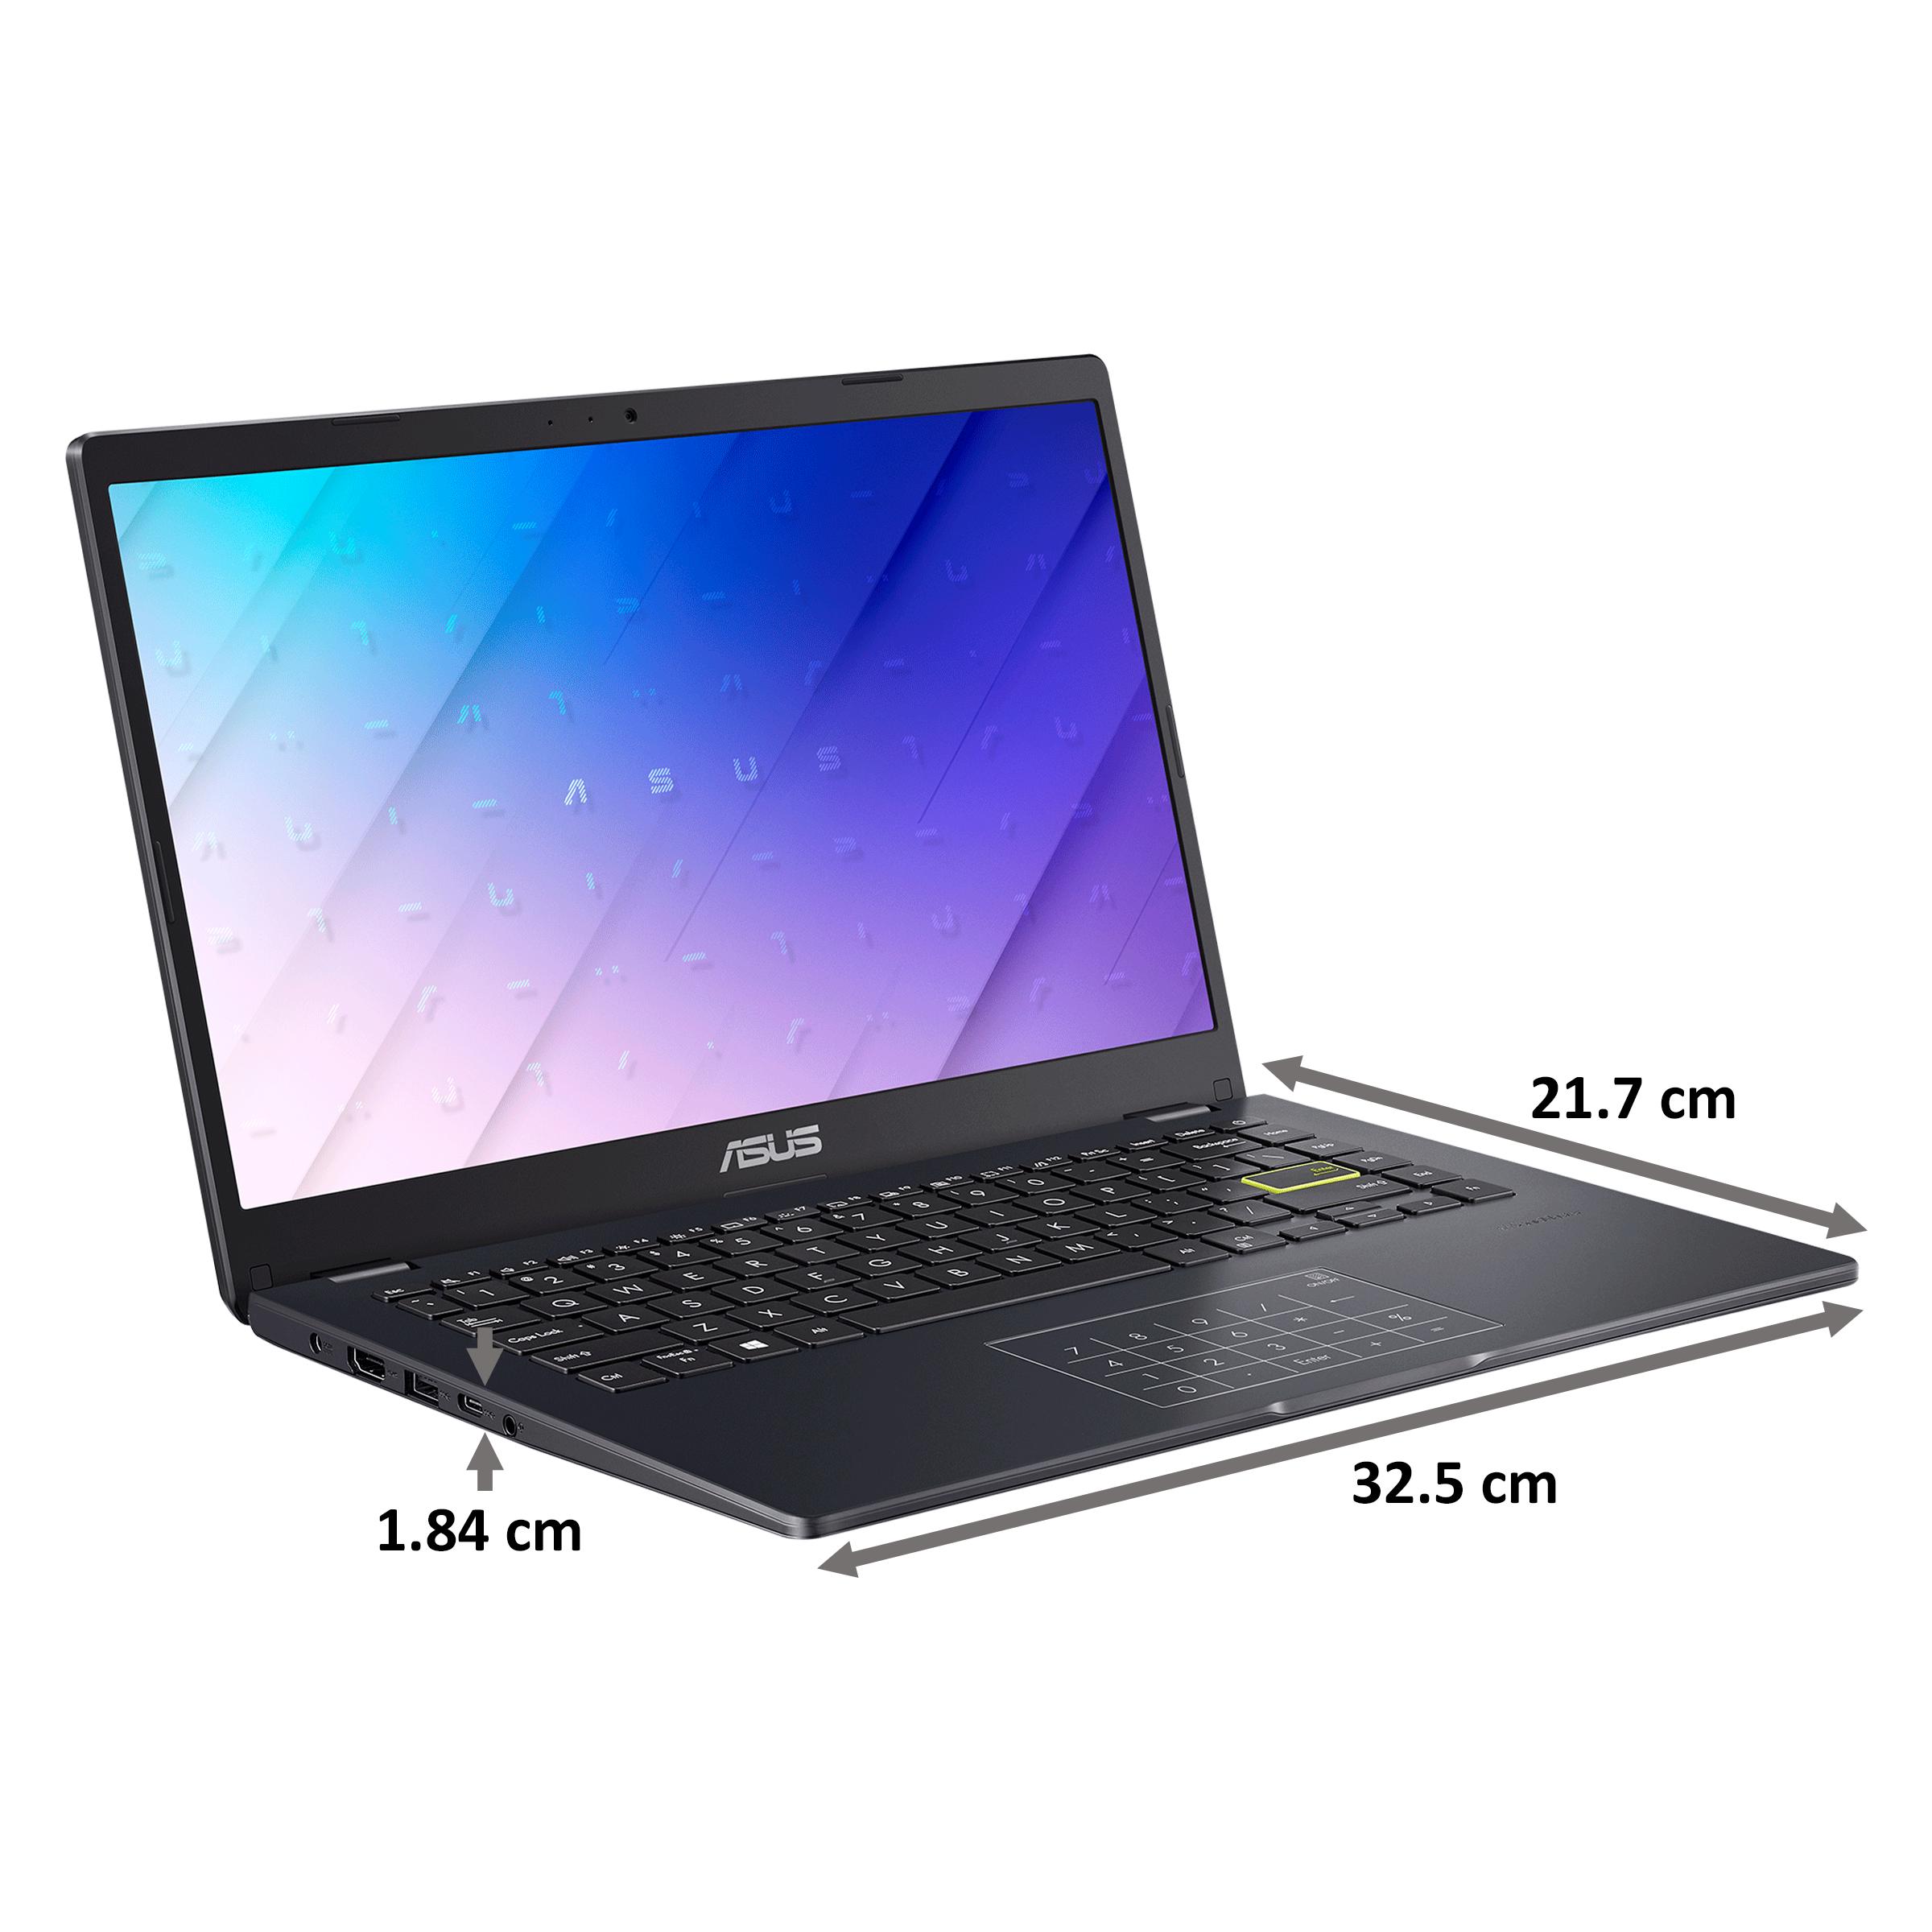 Asus E410MA-EB001T (90NB0Q11-M22940) Celeron Windows 10 Home Laptop (4GB RAM, 256GB SSD, Intel UHD Graphics 600, 35.56cm, Peacock Blue) 2